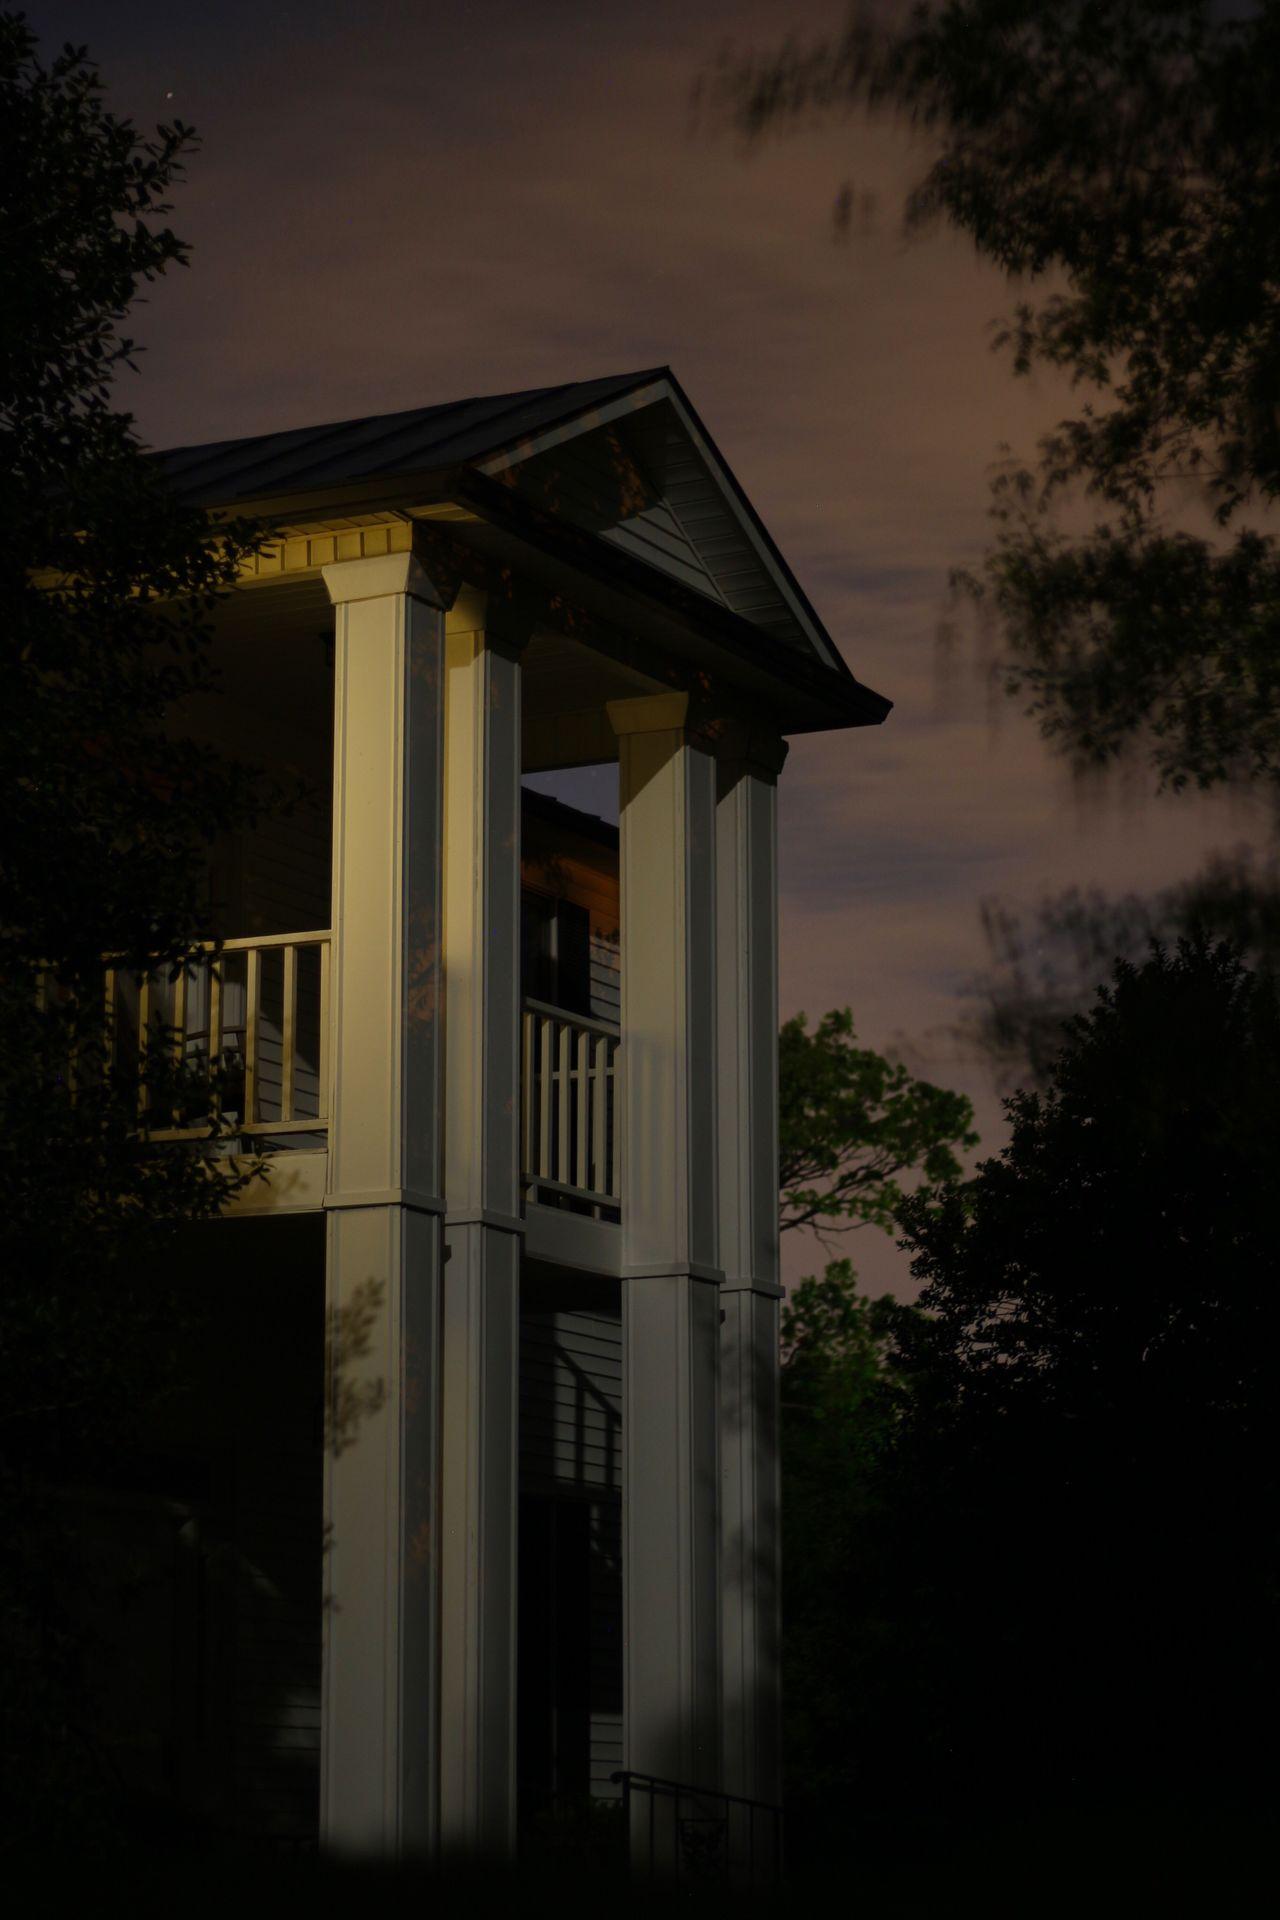 Nightscape Nightphotography Onestar Architecture Antebellum Outdoors Moonlight